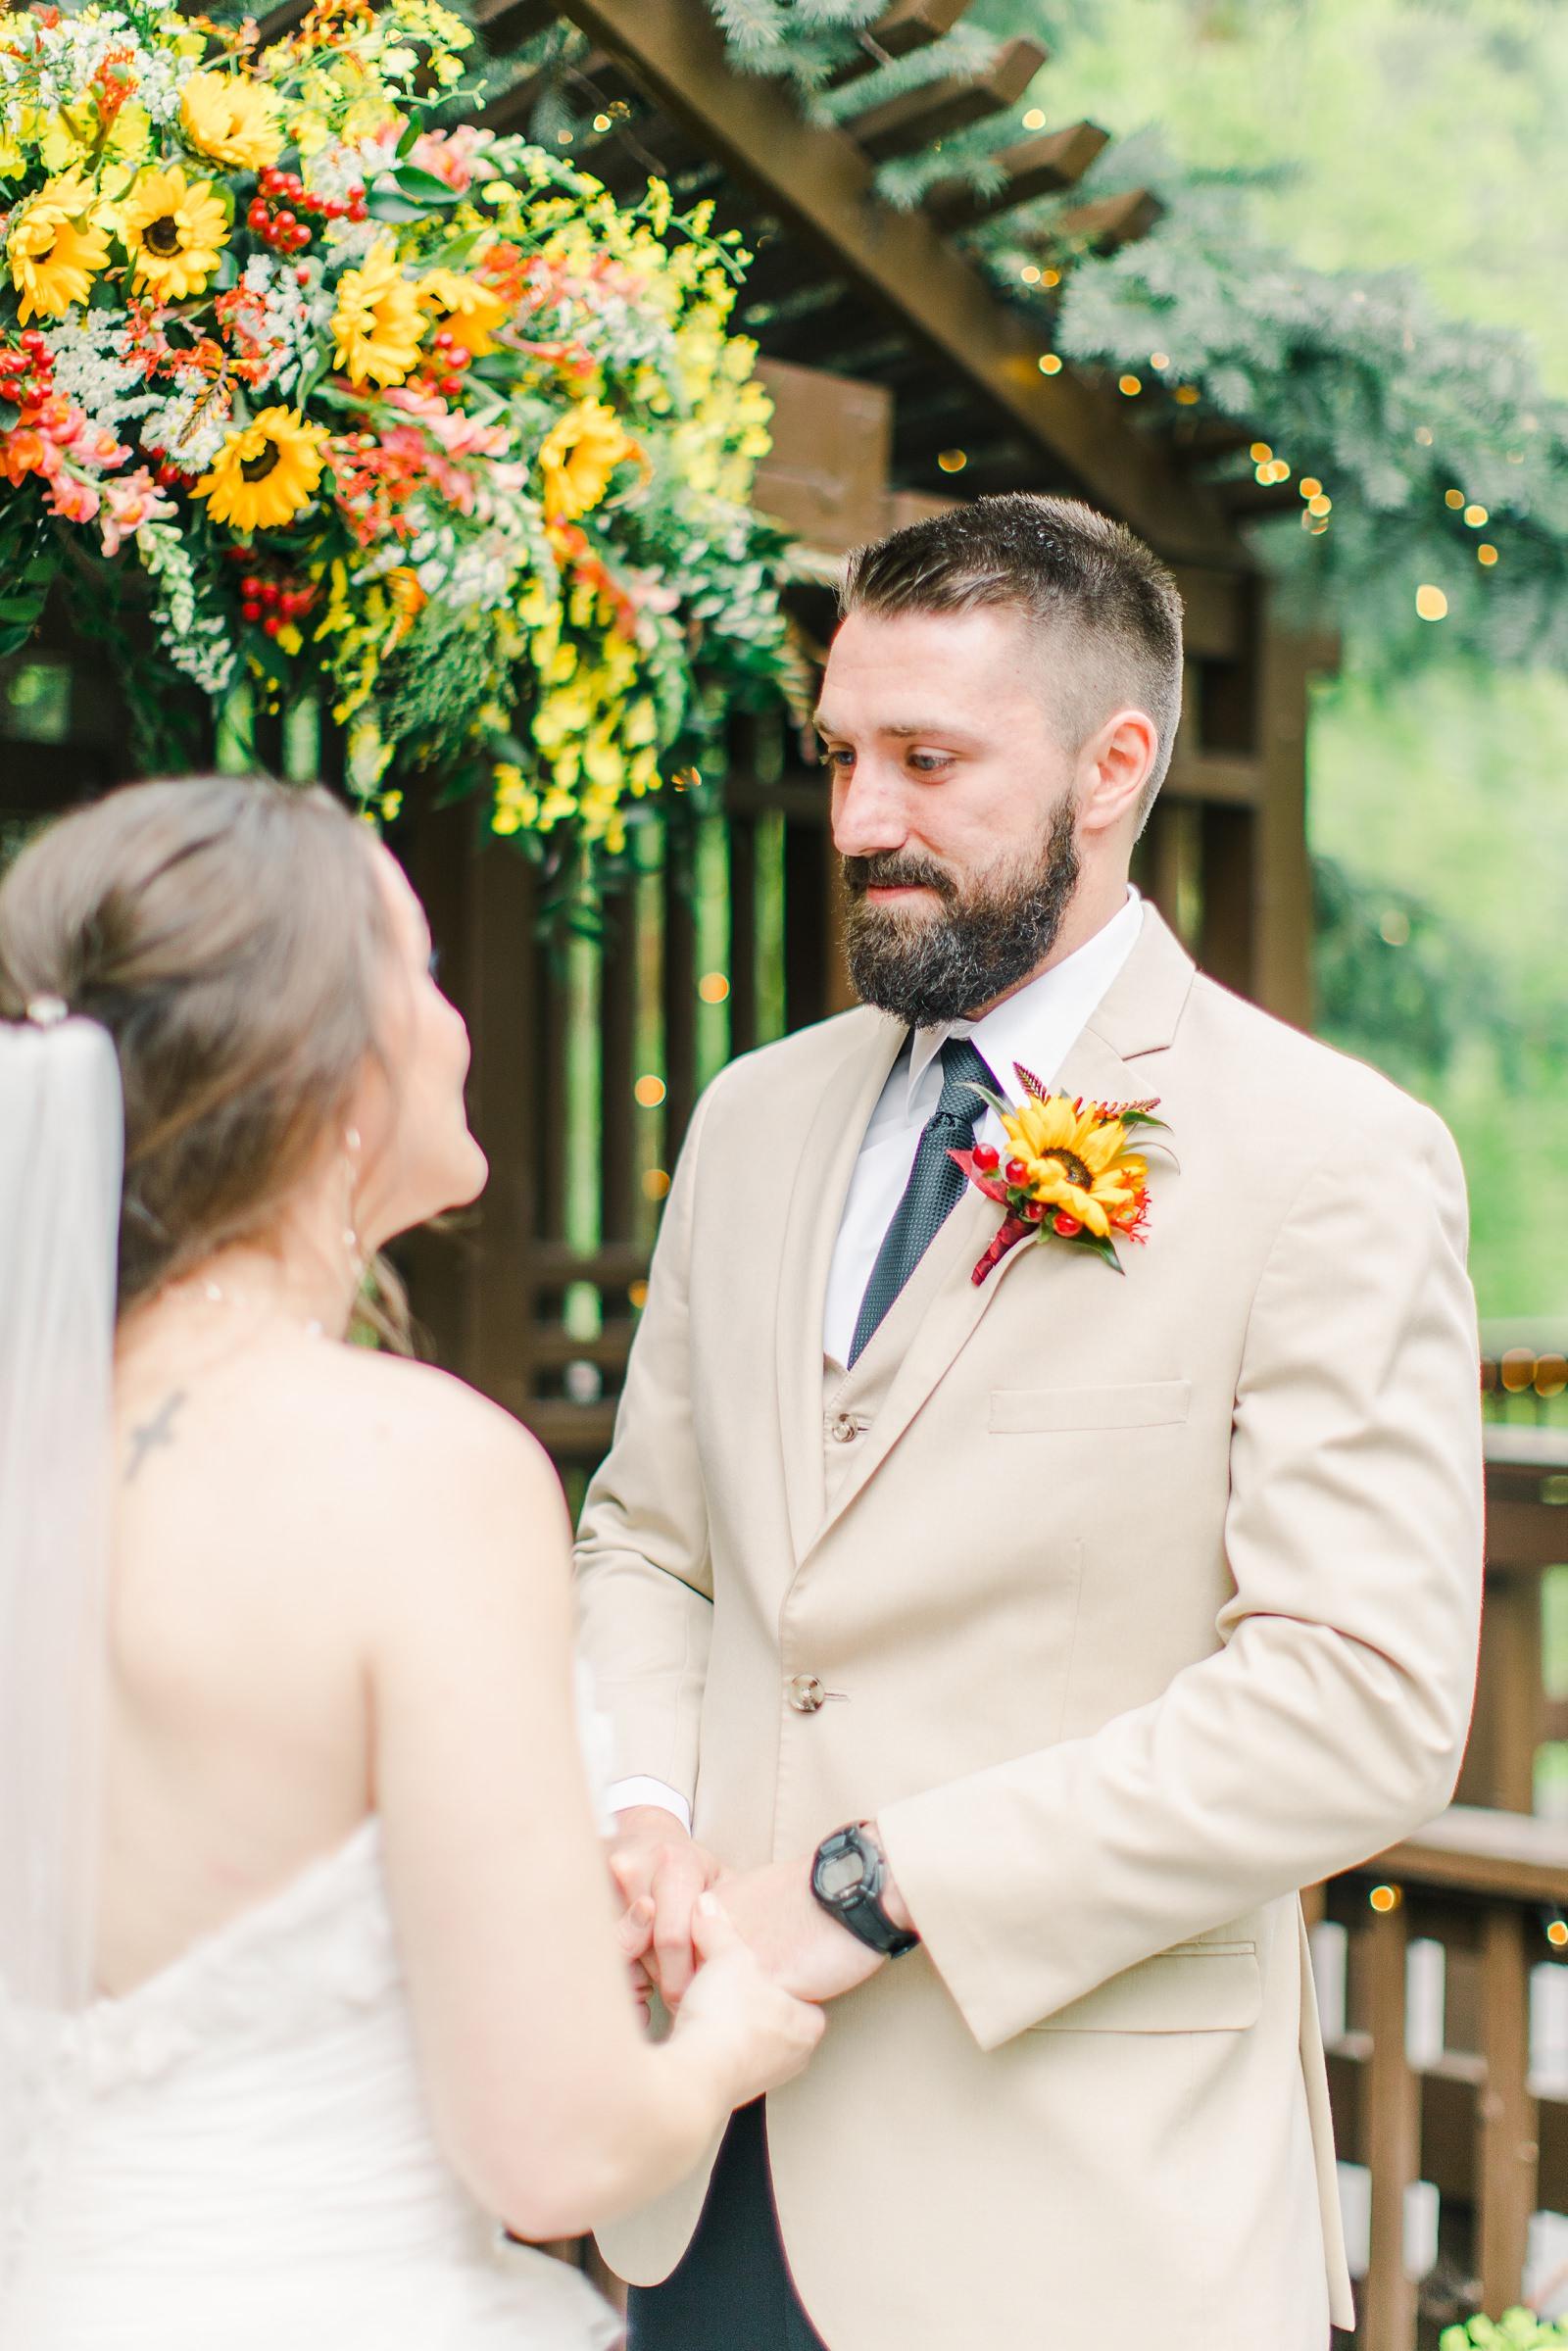 Millcreek Inn Summer Wedding, Utah wedding photography Millcreek Canyon, Salt Lake City, mountain ceremony, groom's vows